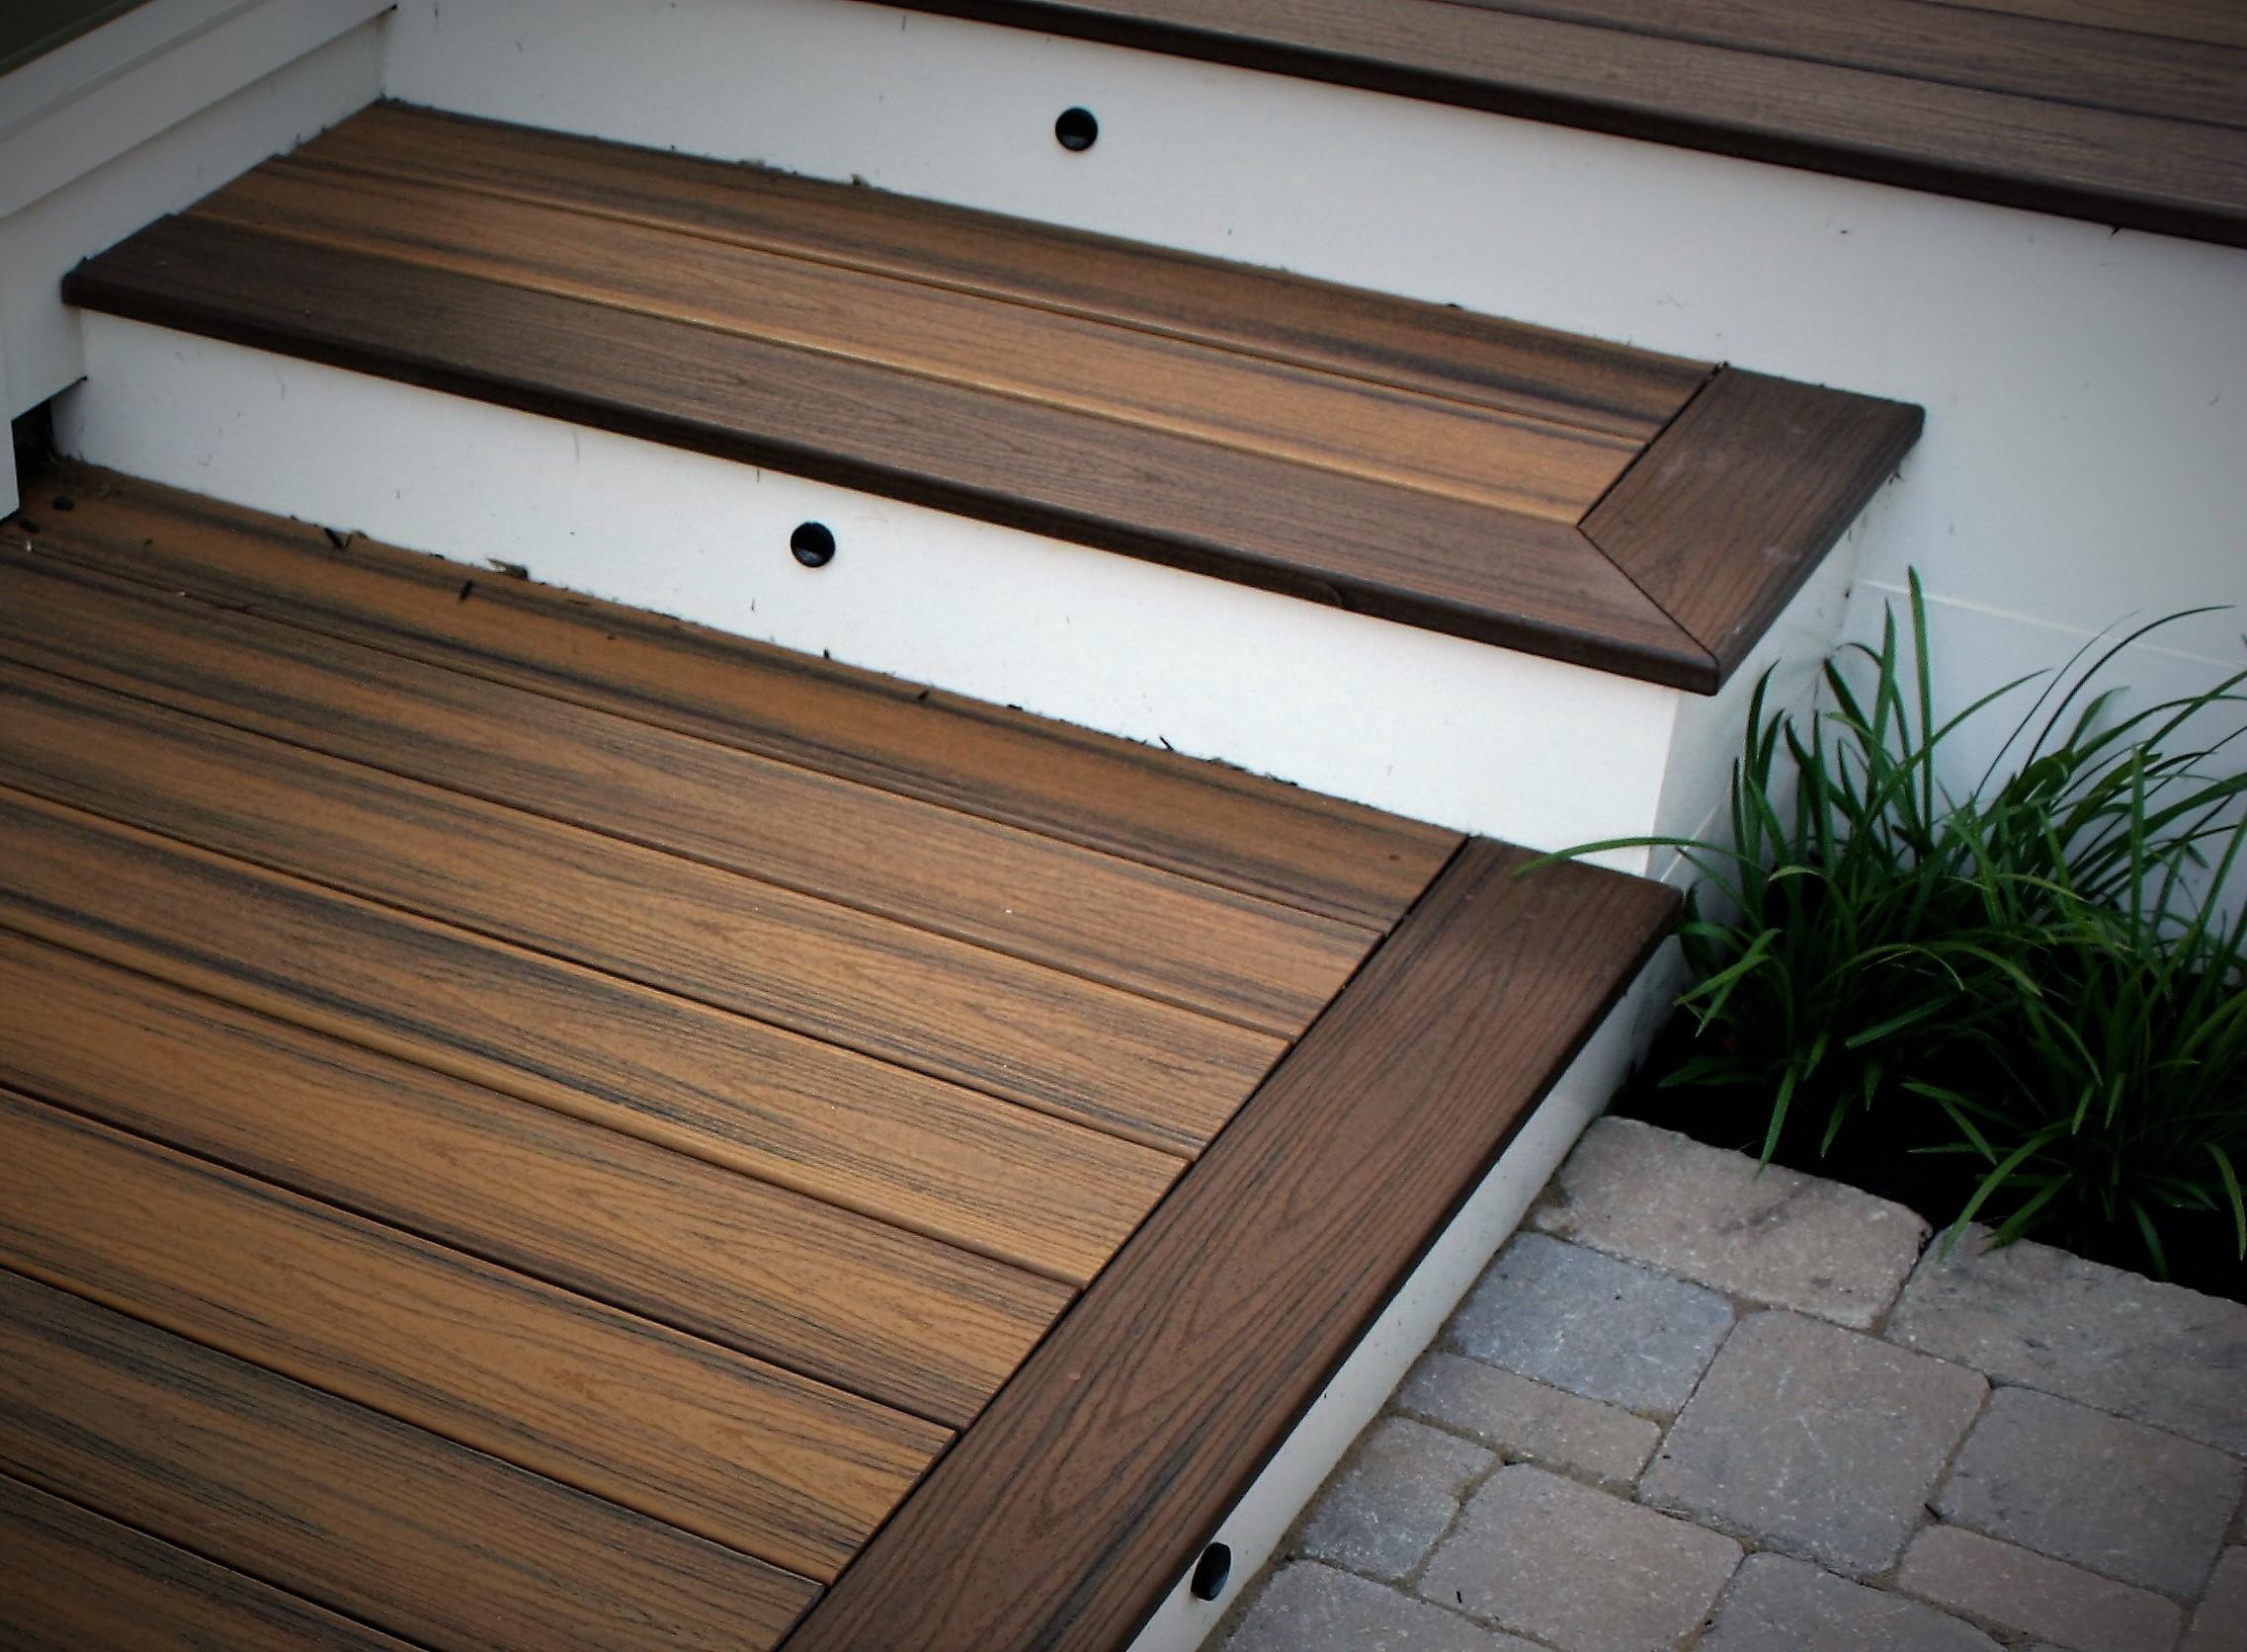 2017 decking comparison trex deck boards vs wood nvjuhfo Gallery